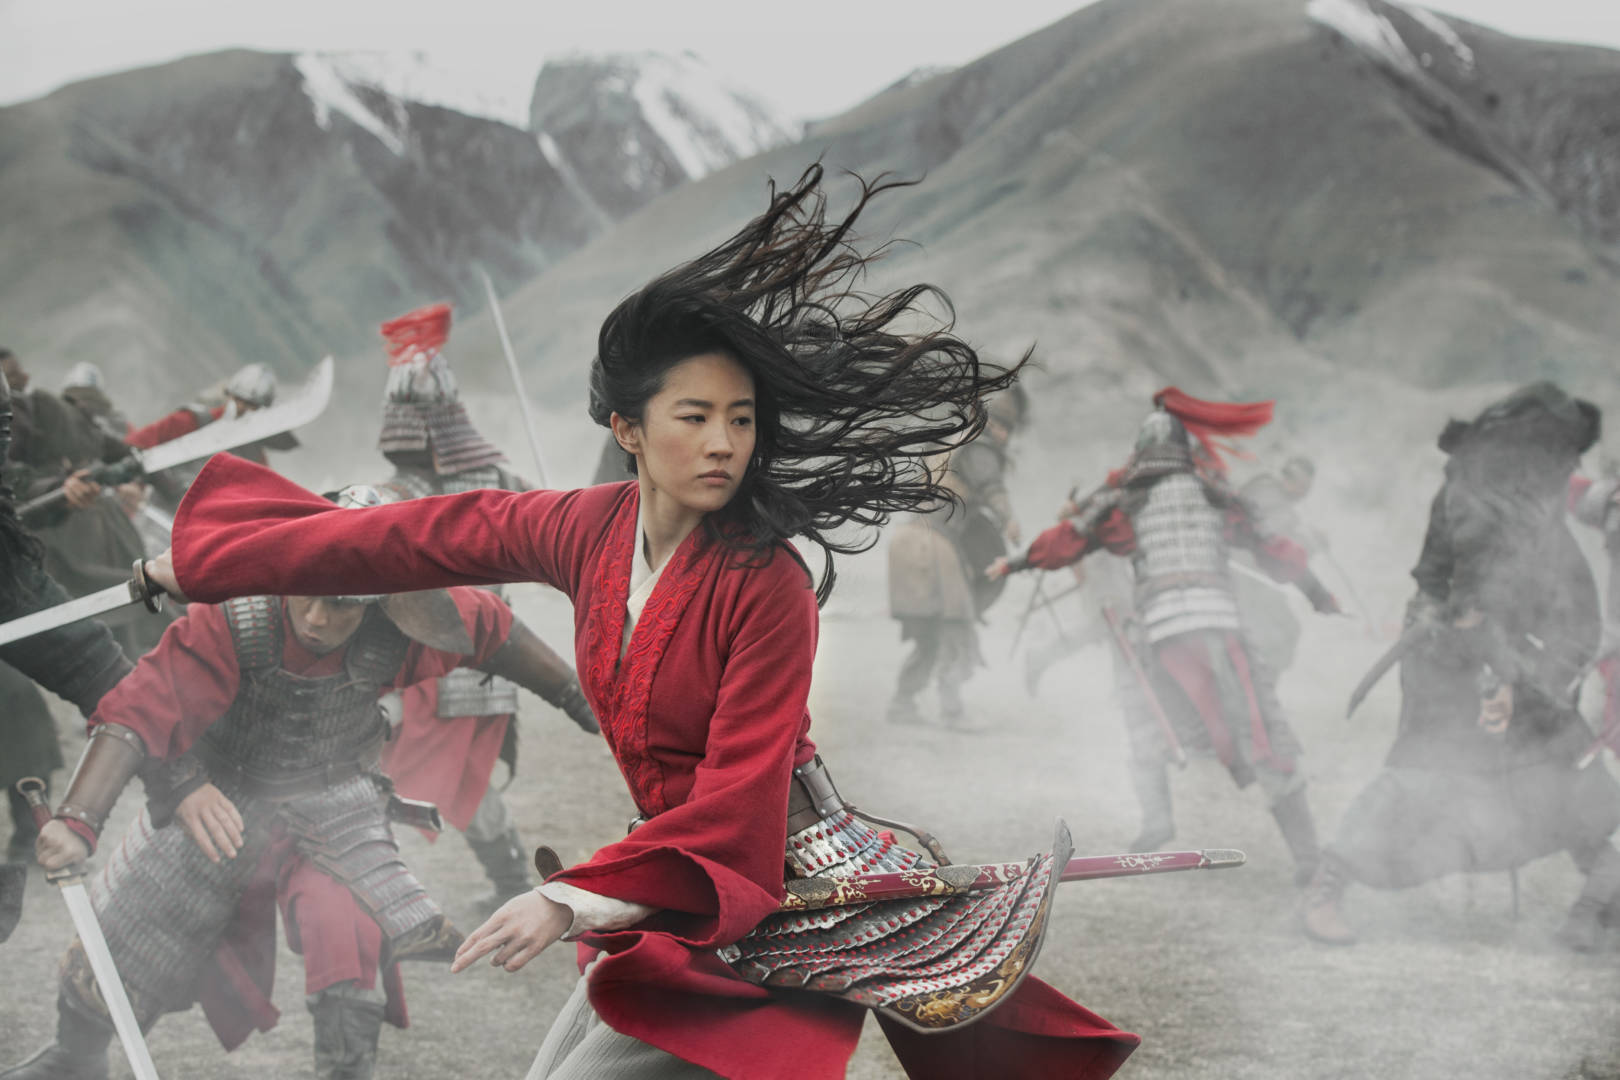 Disney Delays Avatar and Star Wars Movies' Release Dates, Postpones Mulan's Indefinitely